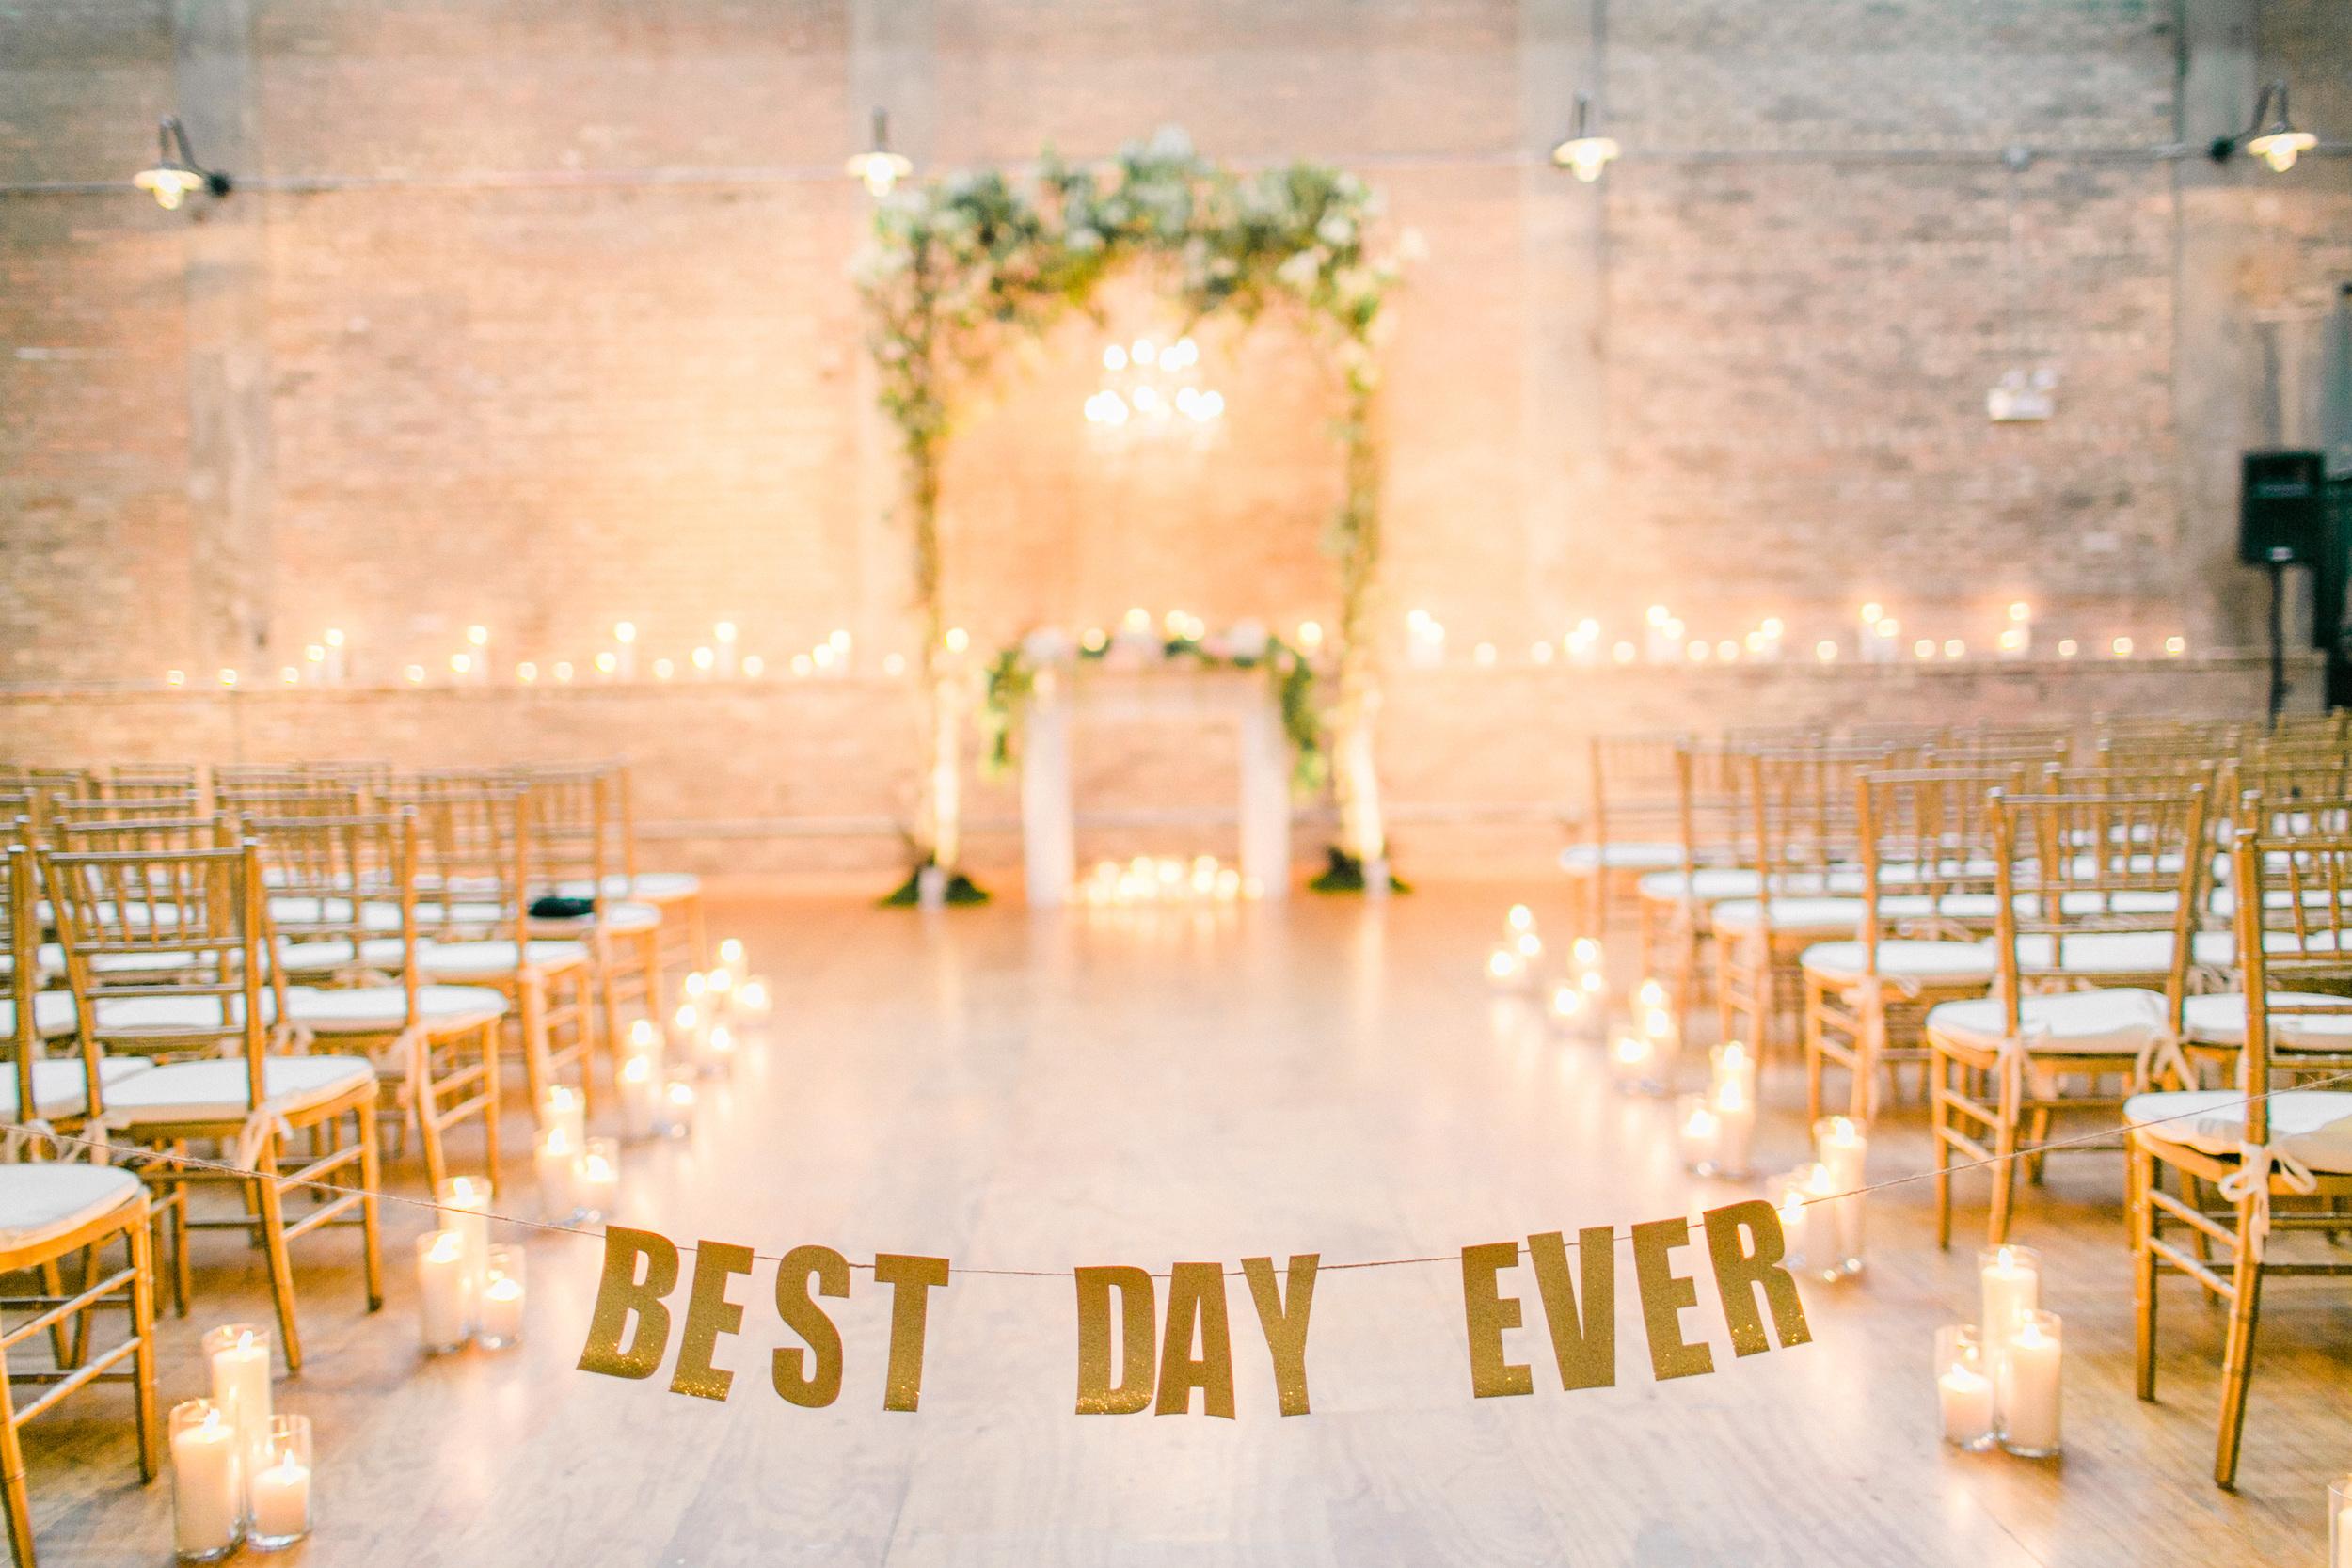 mayden_photography_weddings-101.jpg